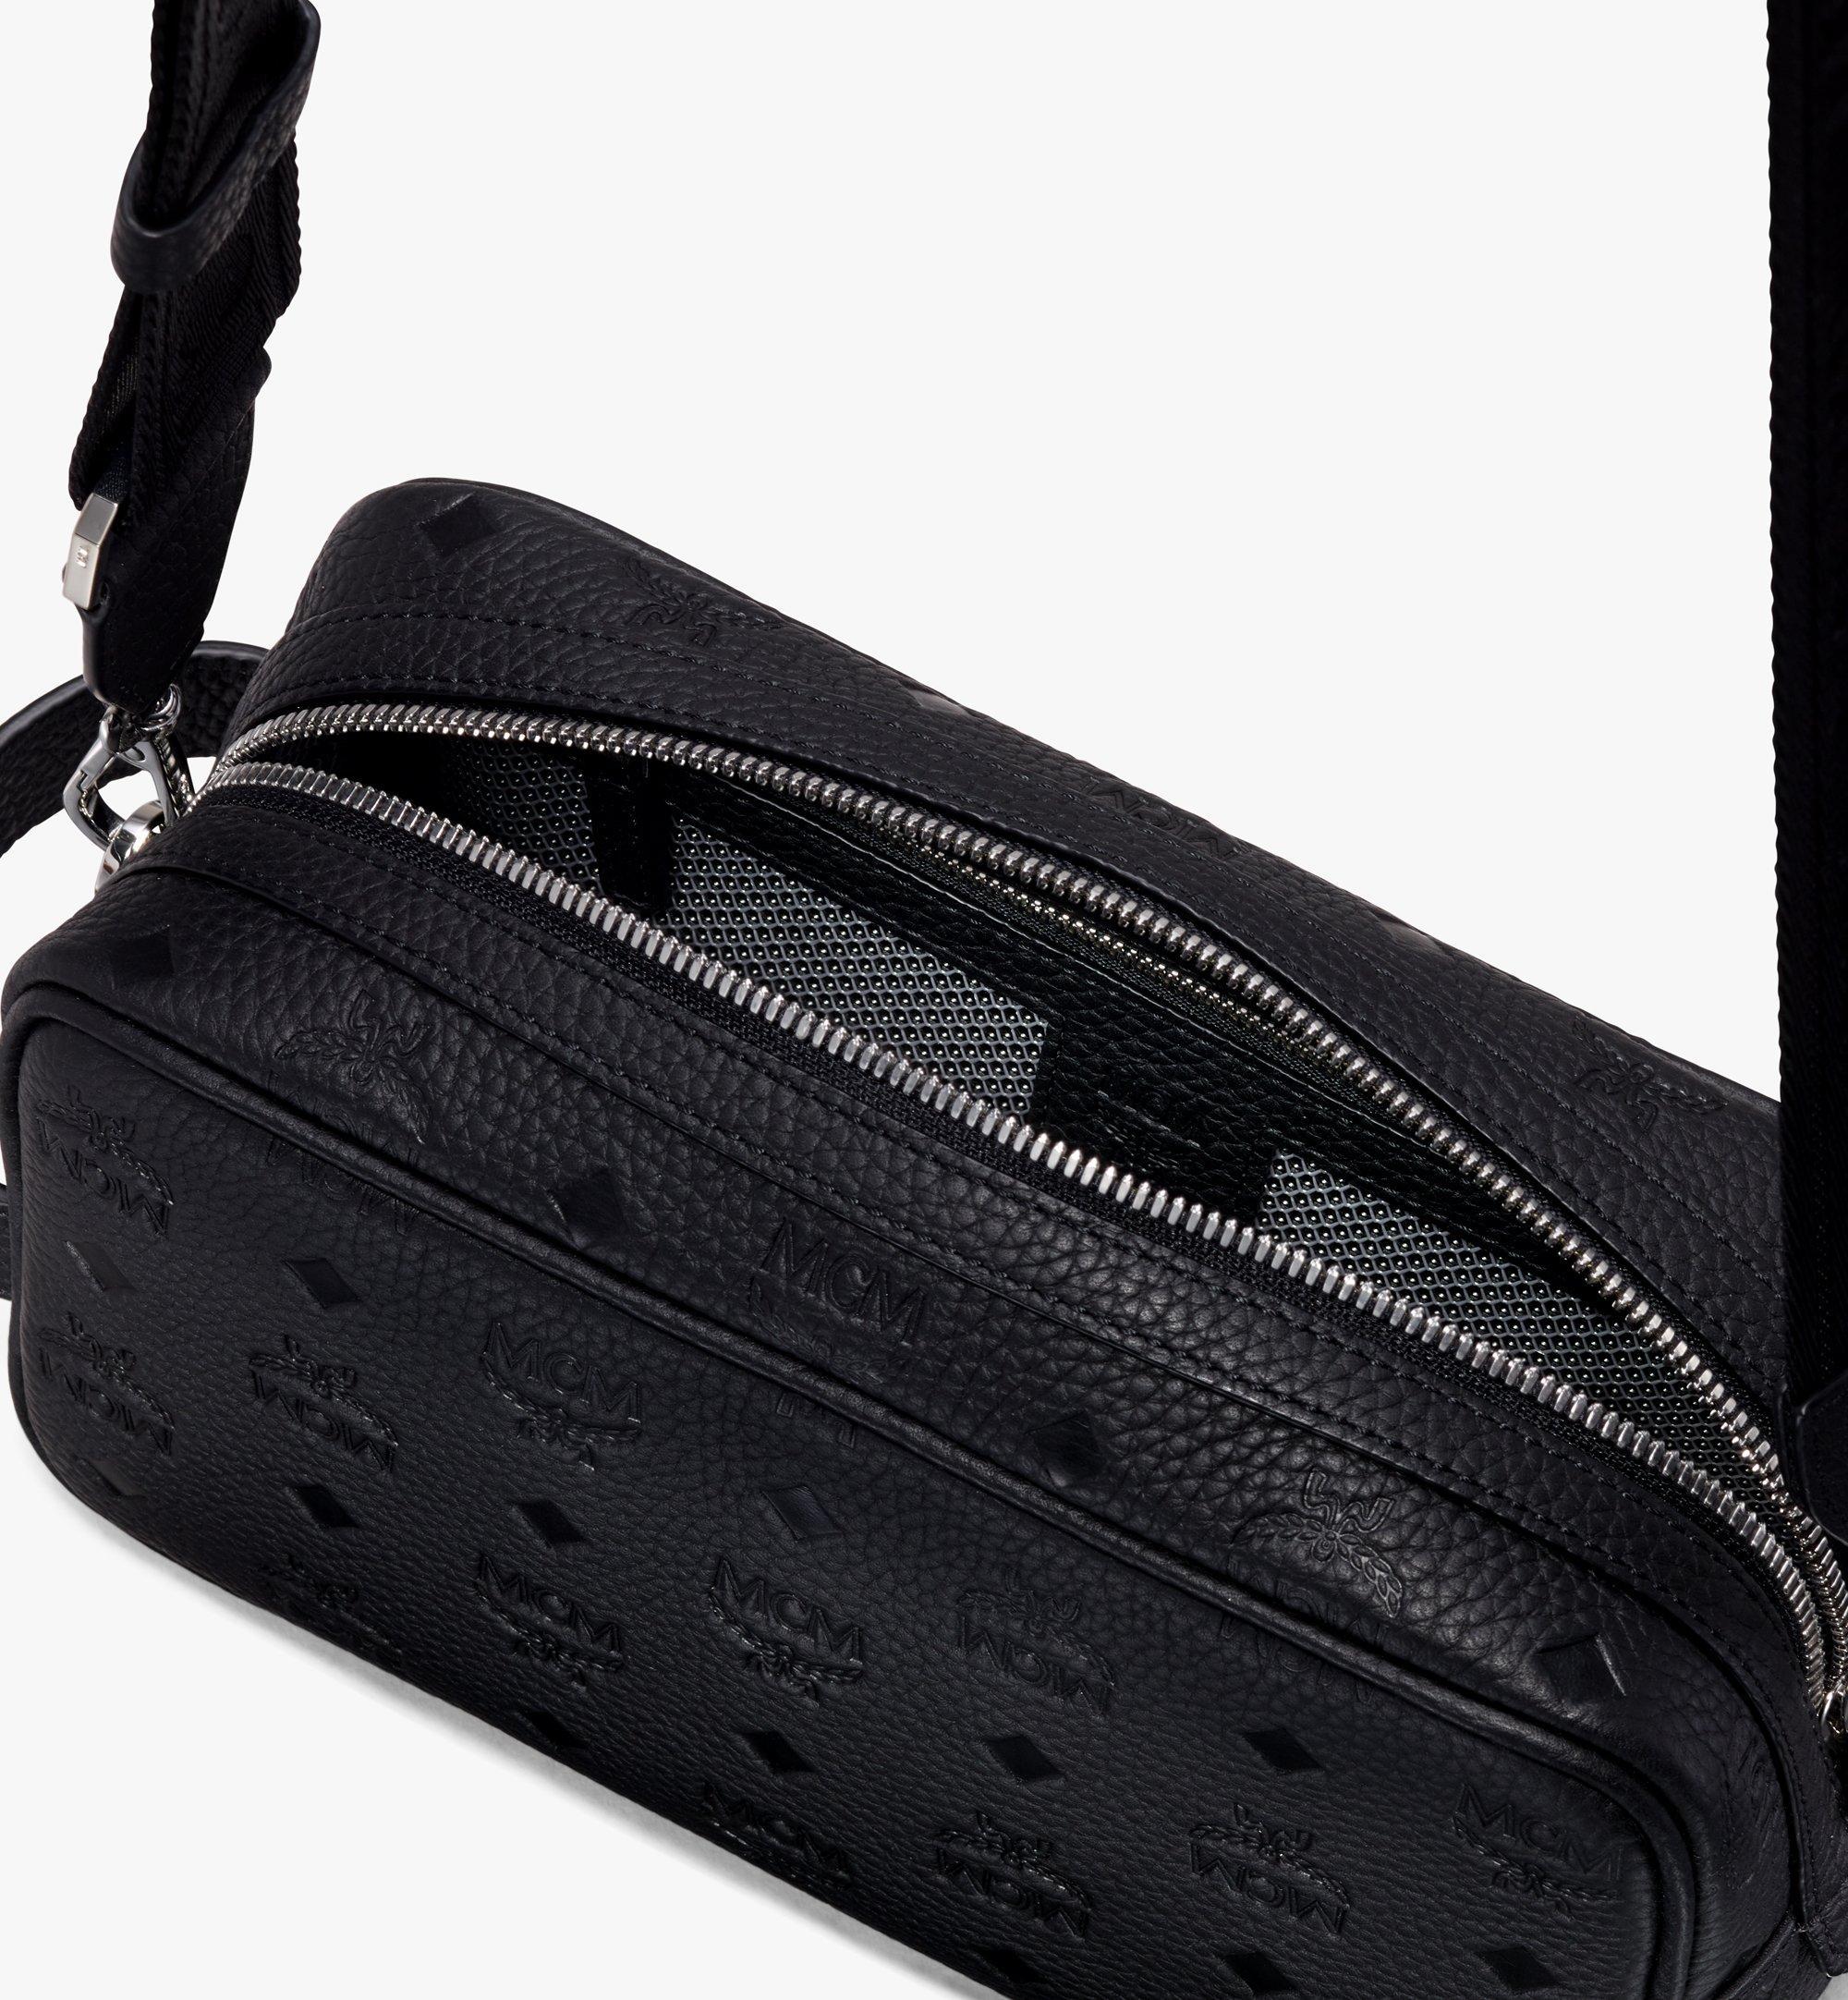 MCM Tivitat Wash Bag in Monogram Leather Black MXZ9ABT28BK001 Alternate View 4